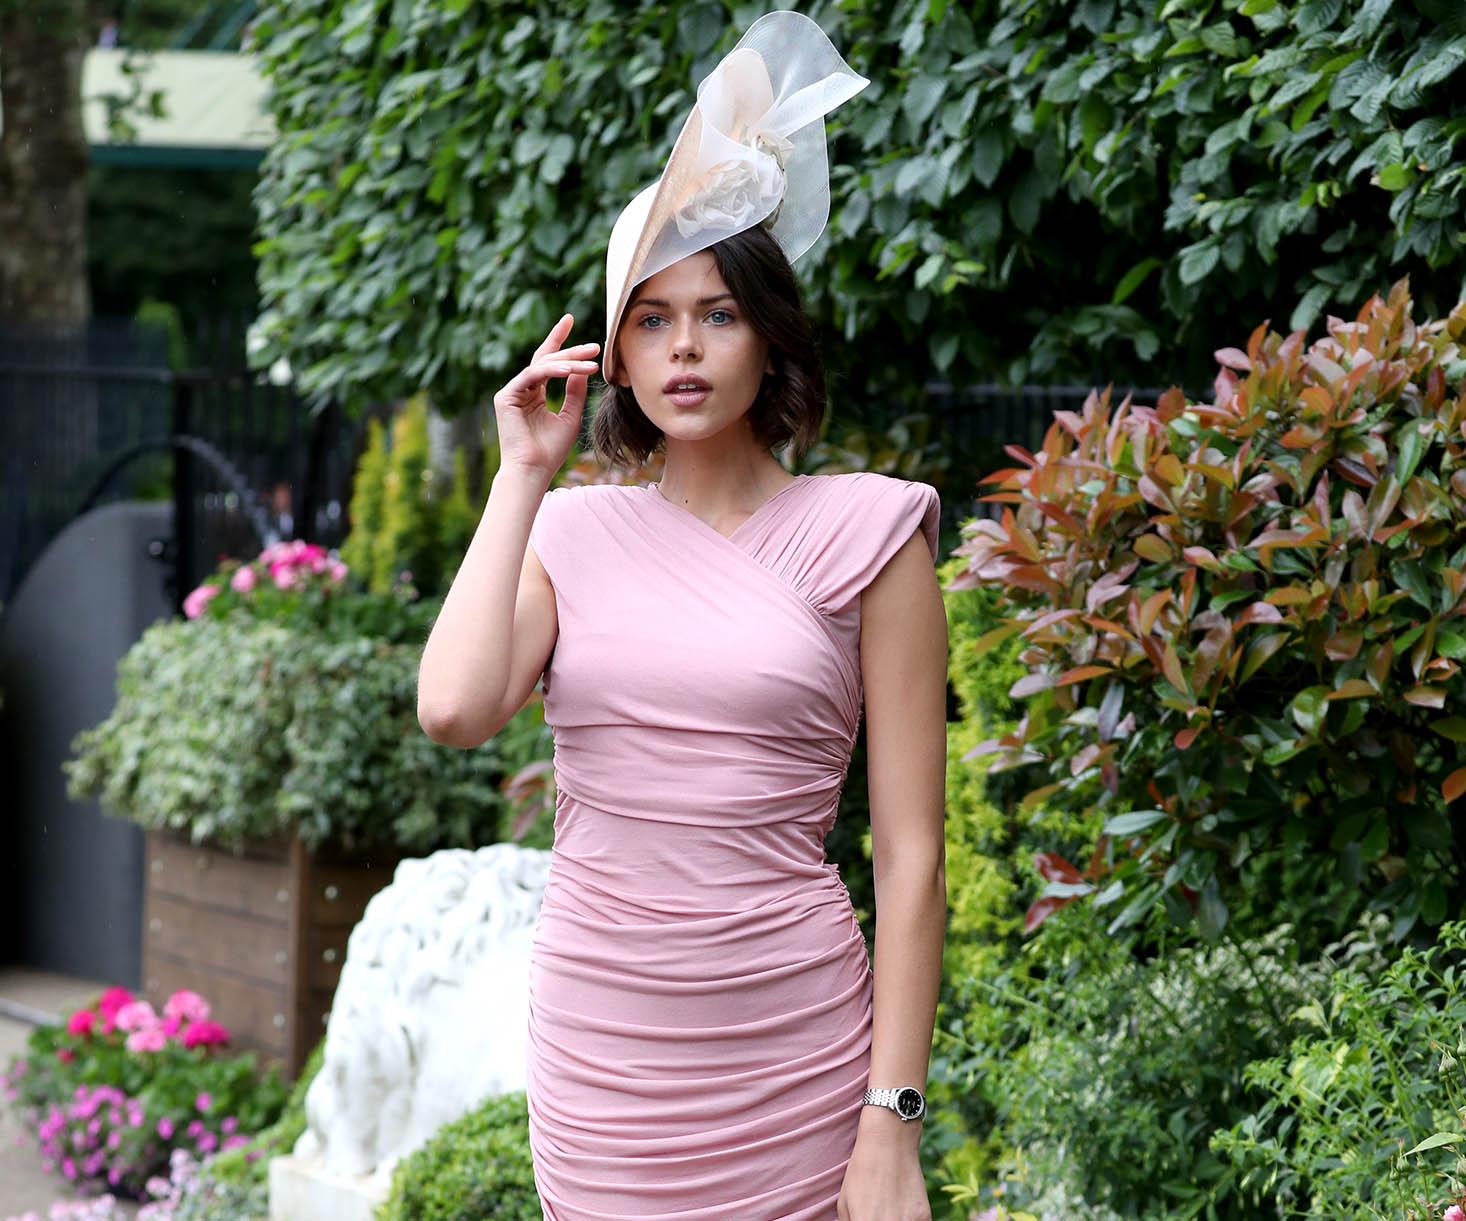 9d614a3a6 https://www.harpersbazaar.com.au/fashion/irina-shayk-tie-dye-trend ...